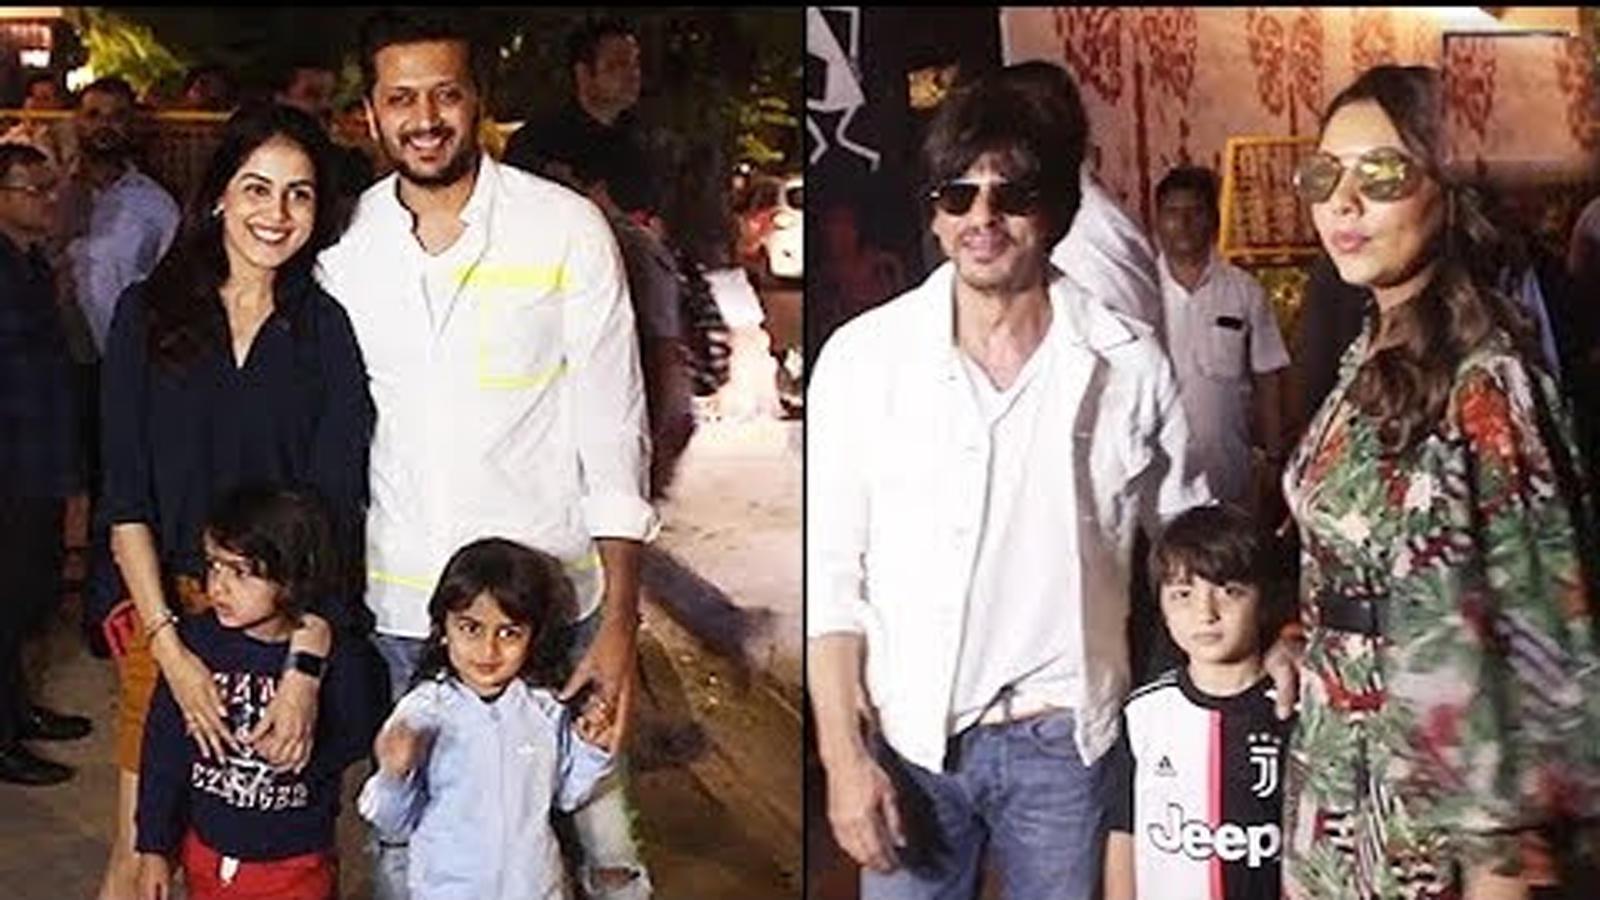 star-kids-who-posed-like-a-pro-at-aishwarya-rai-bachchan-and-abhishek-bachchans-darling-daughter-aaradhyas-birthday-party